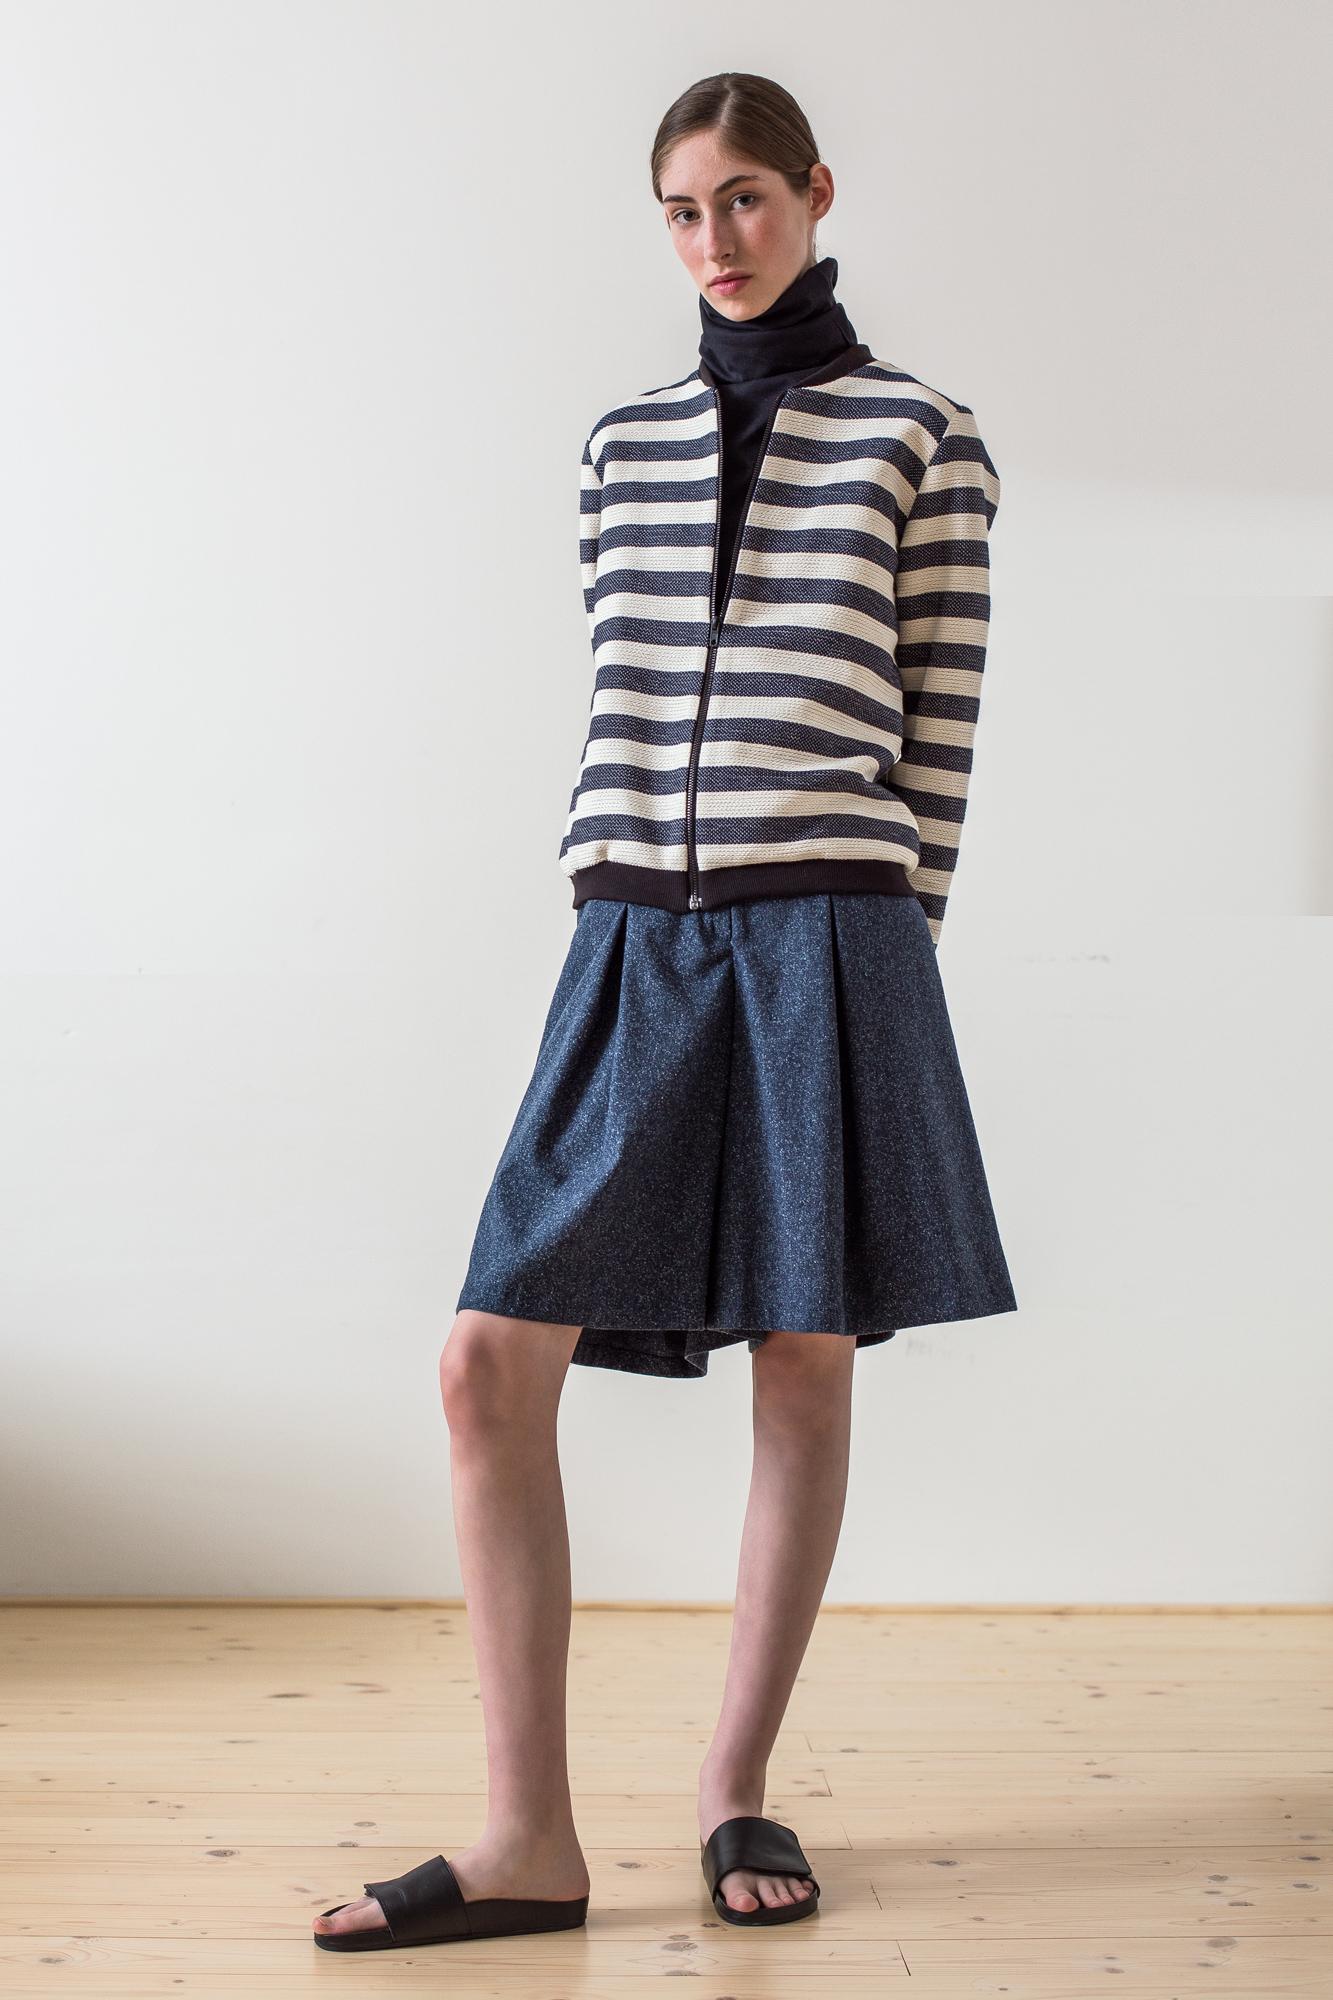 wearenotsisters_wrns_contour-jacket_03